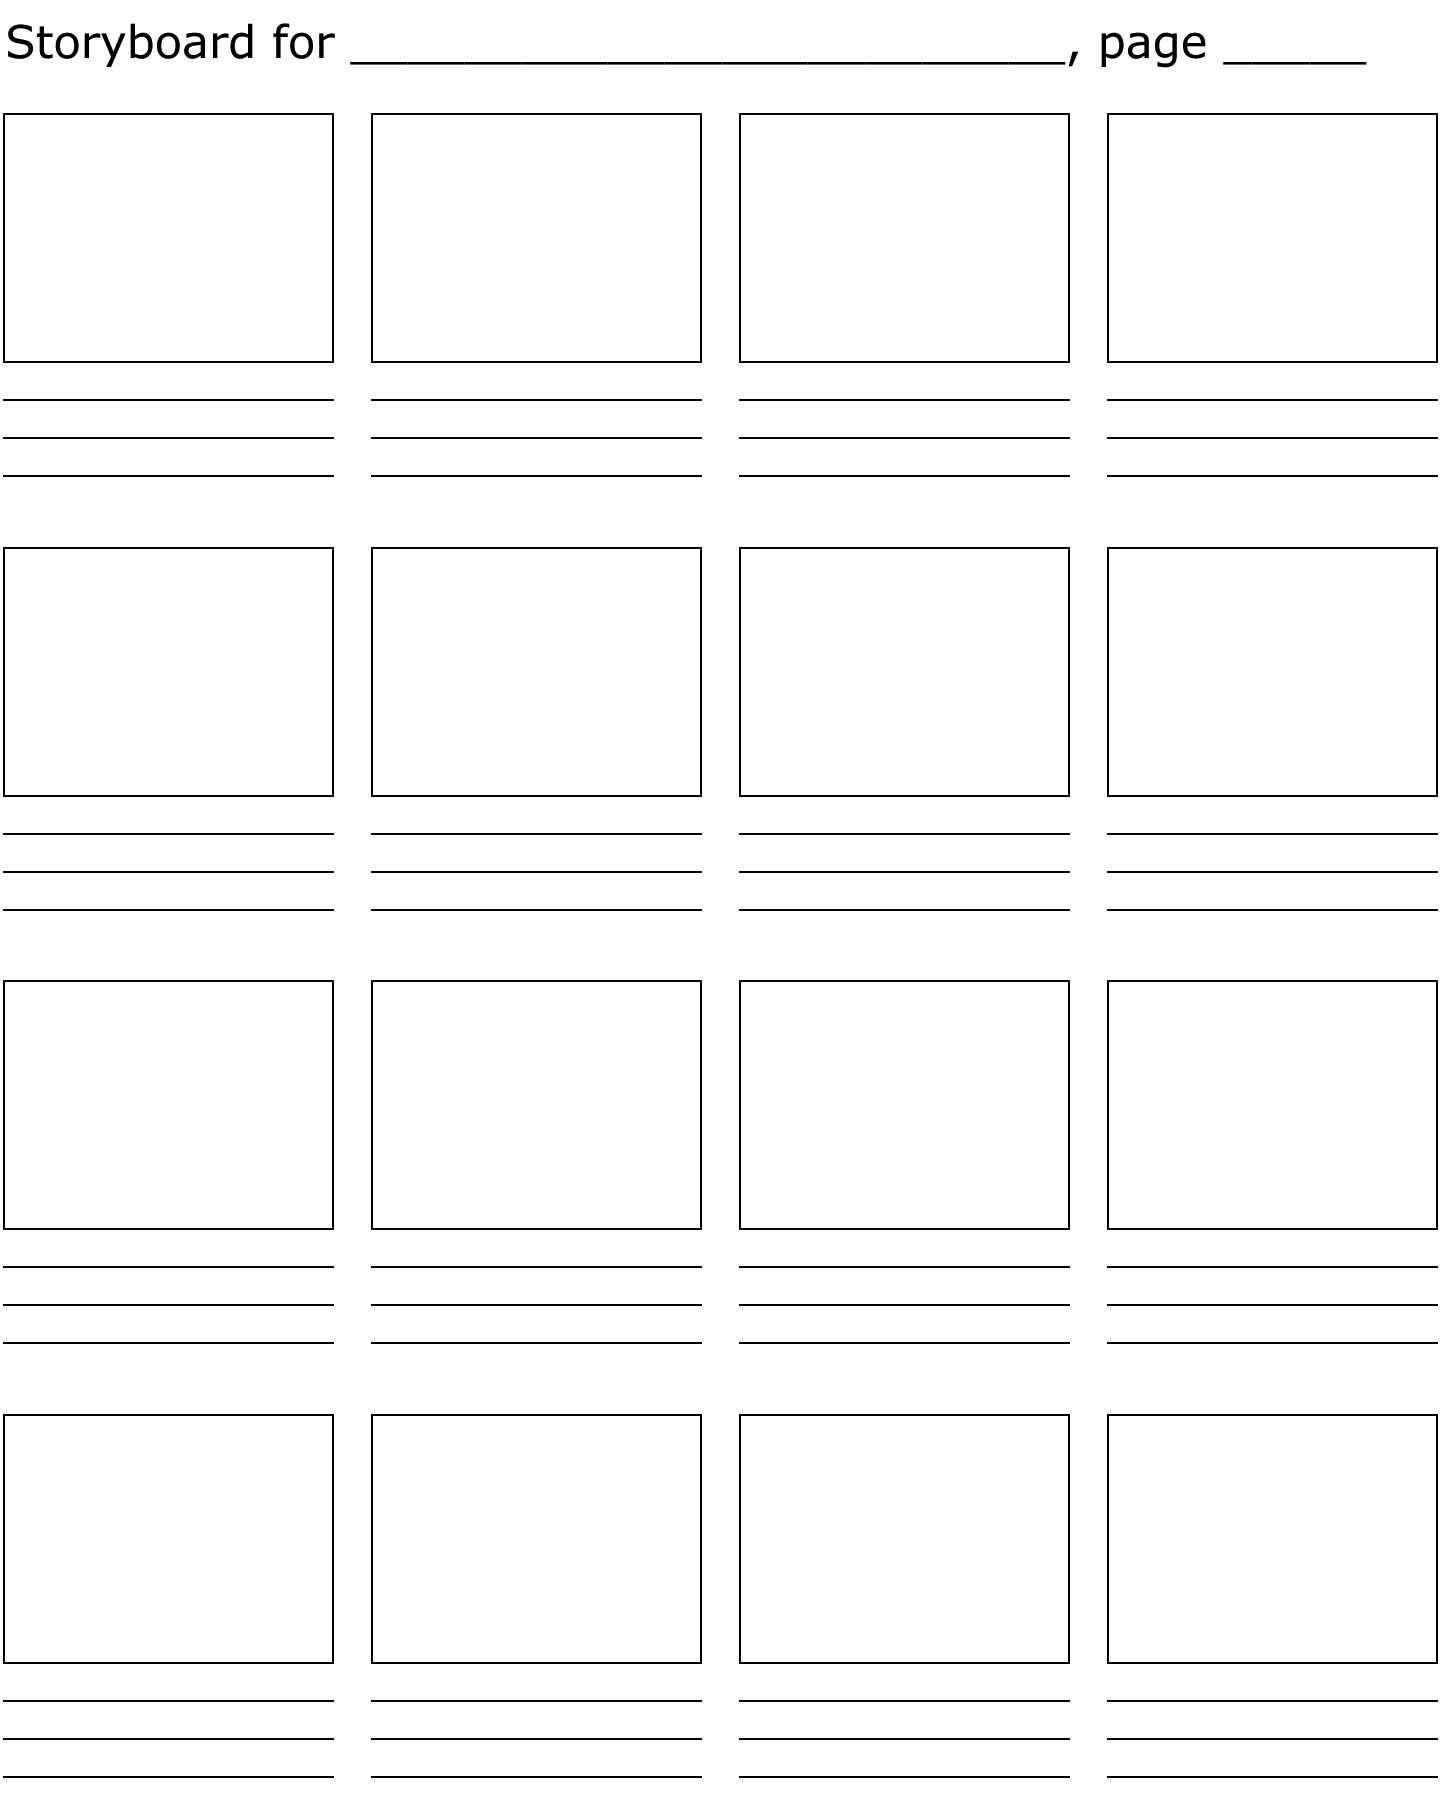 Storyboard Template Storyboard Template Storyboard Storyboard